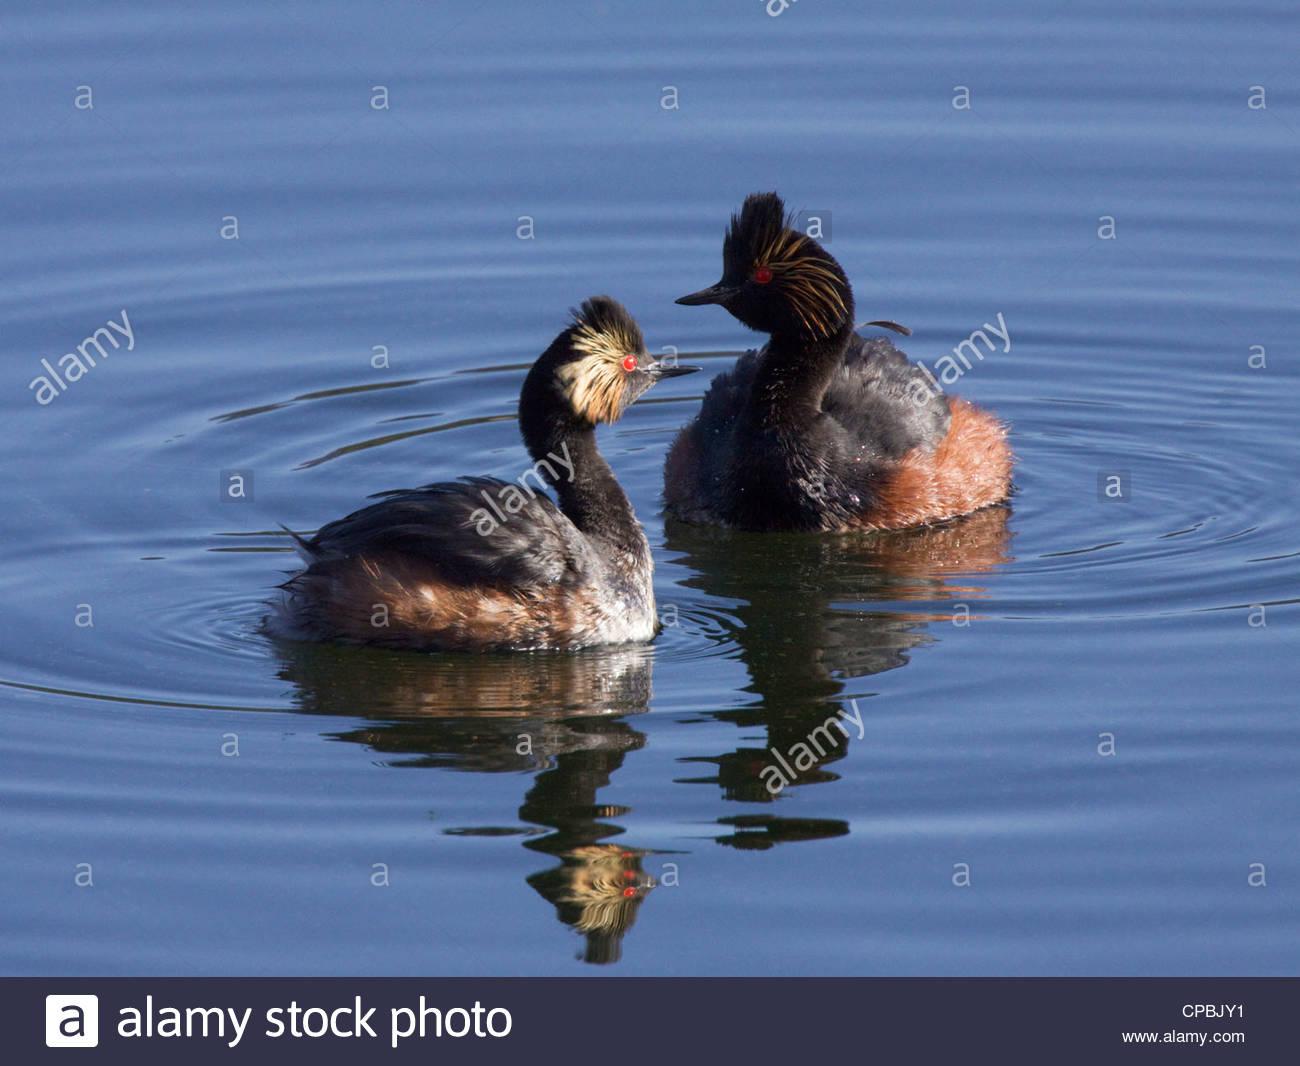 Eared Grebes Podiceps nigricollis pair swimming Arizona - Stock Image